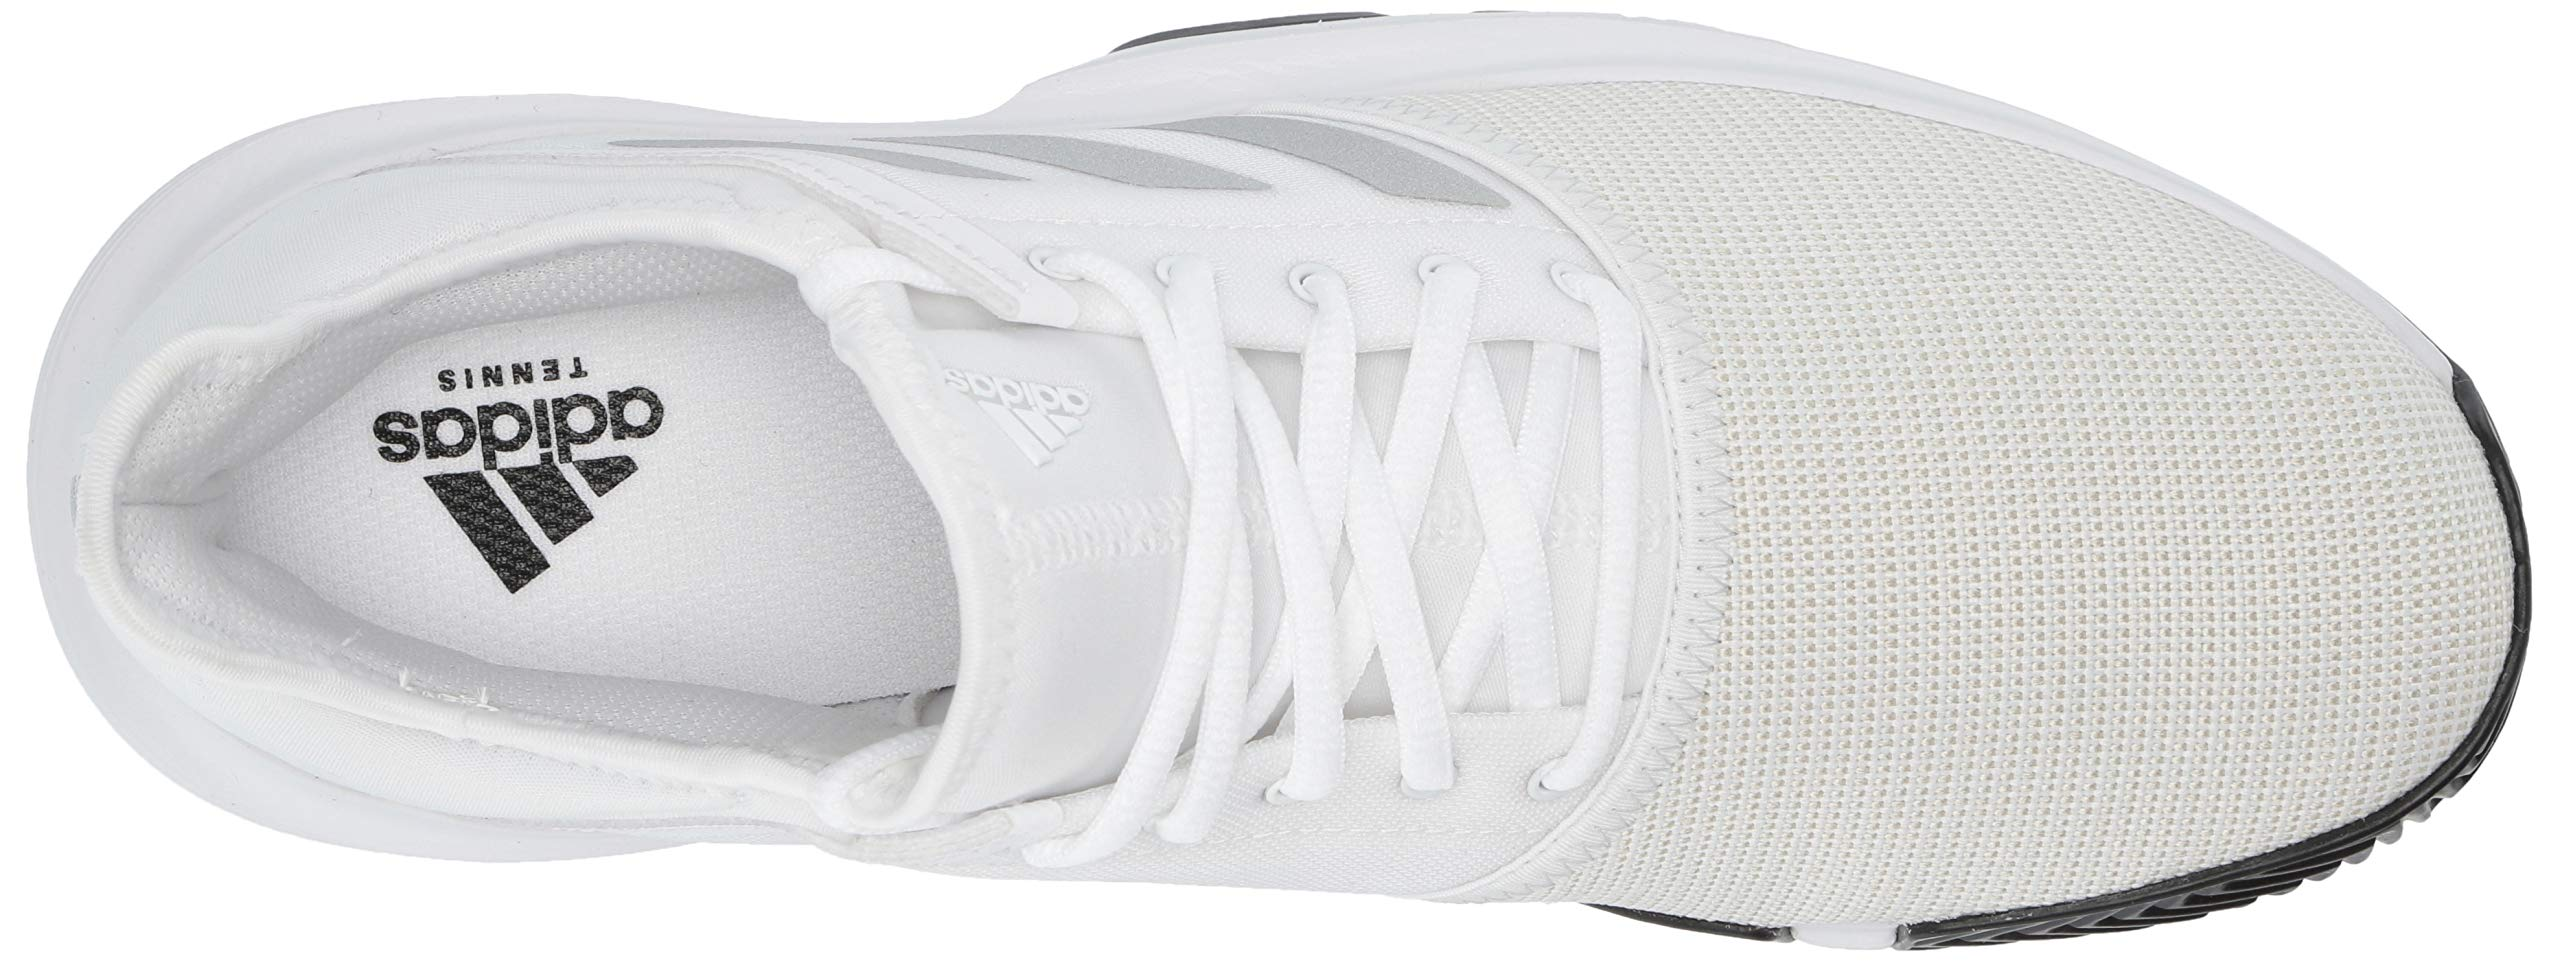 adidas Men's Gamecourt, White/Matte Silver/Black, 7.5 M US by adidas (Image #11)